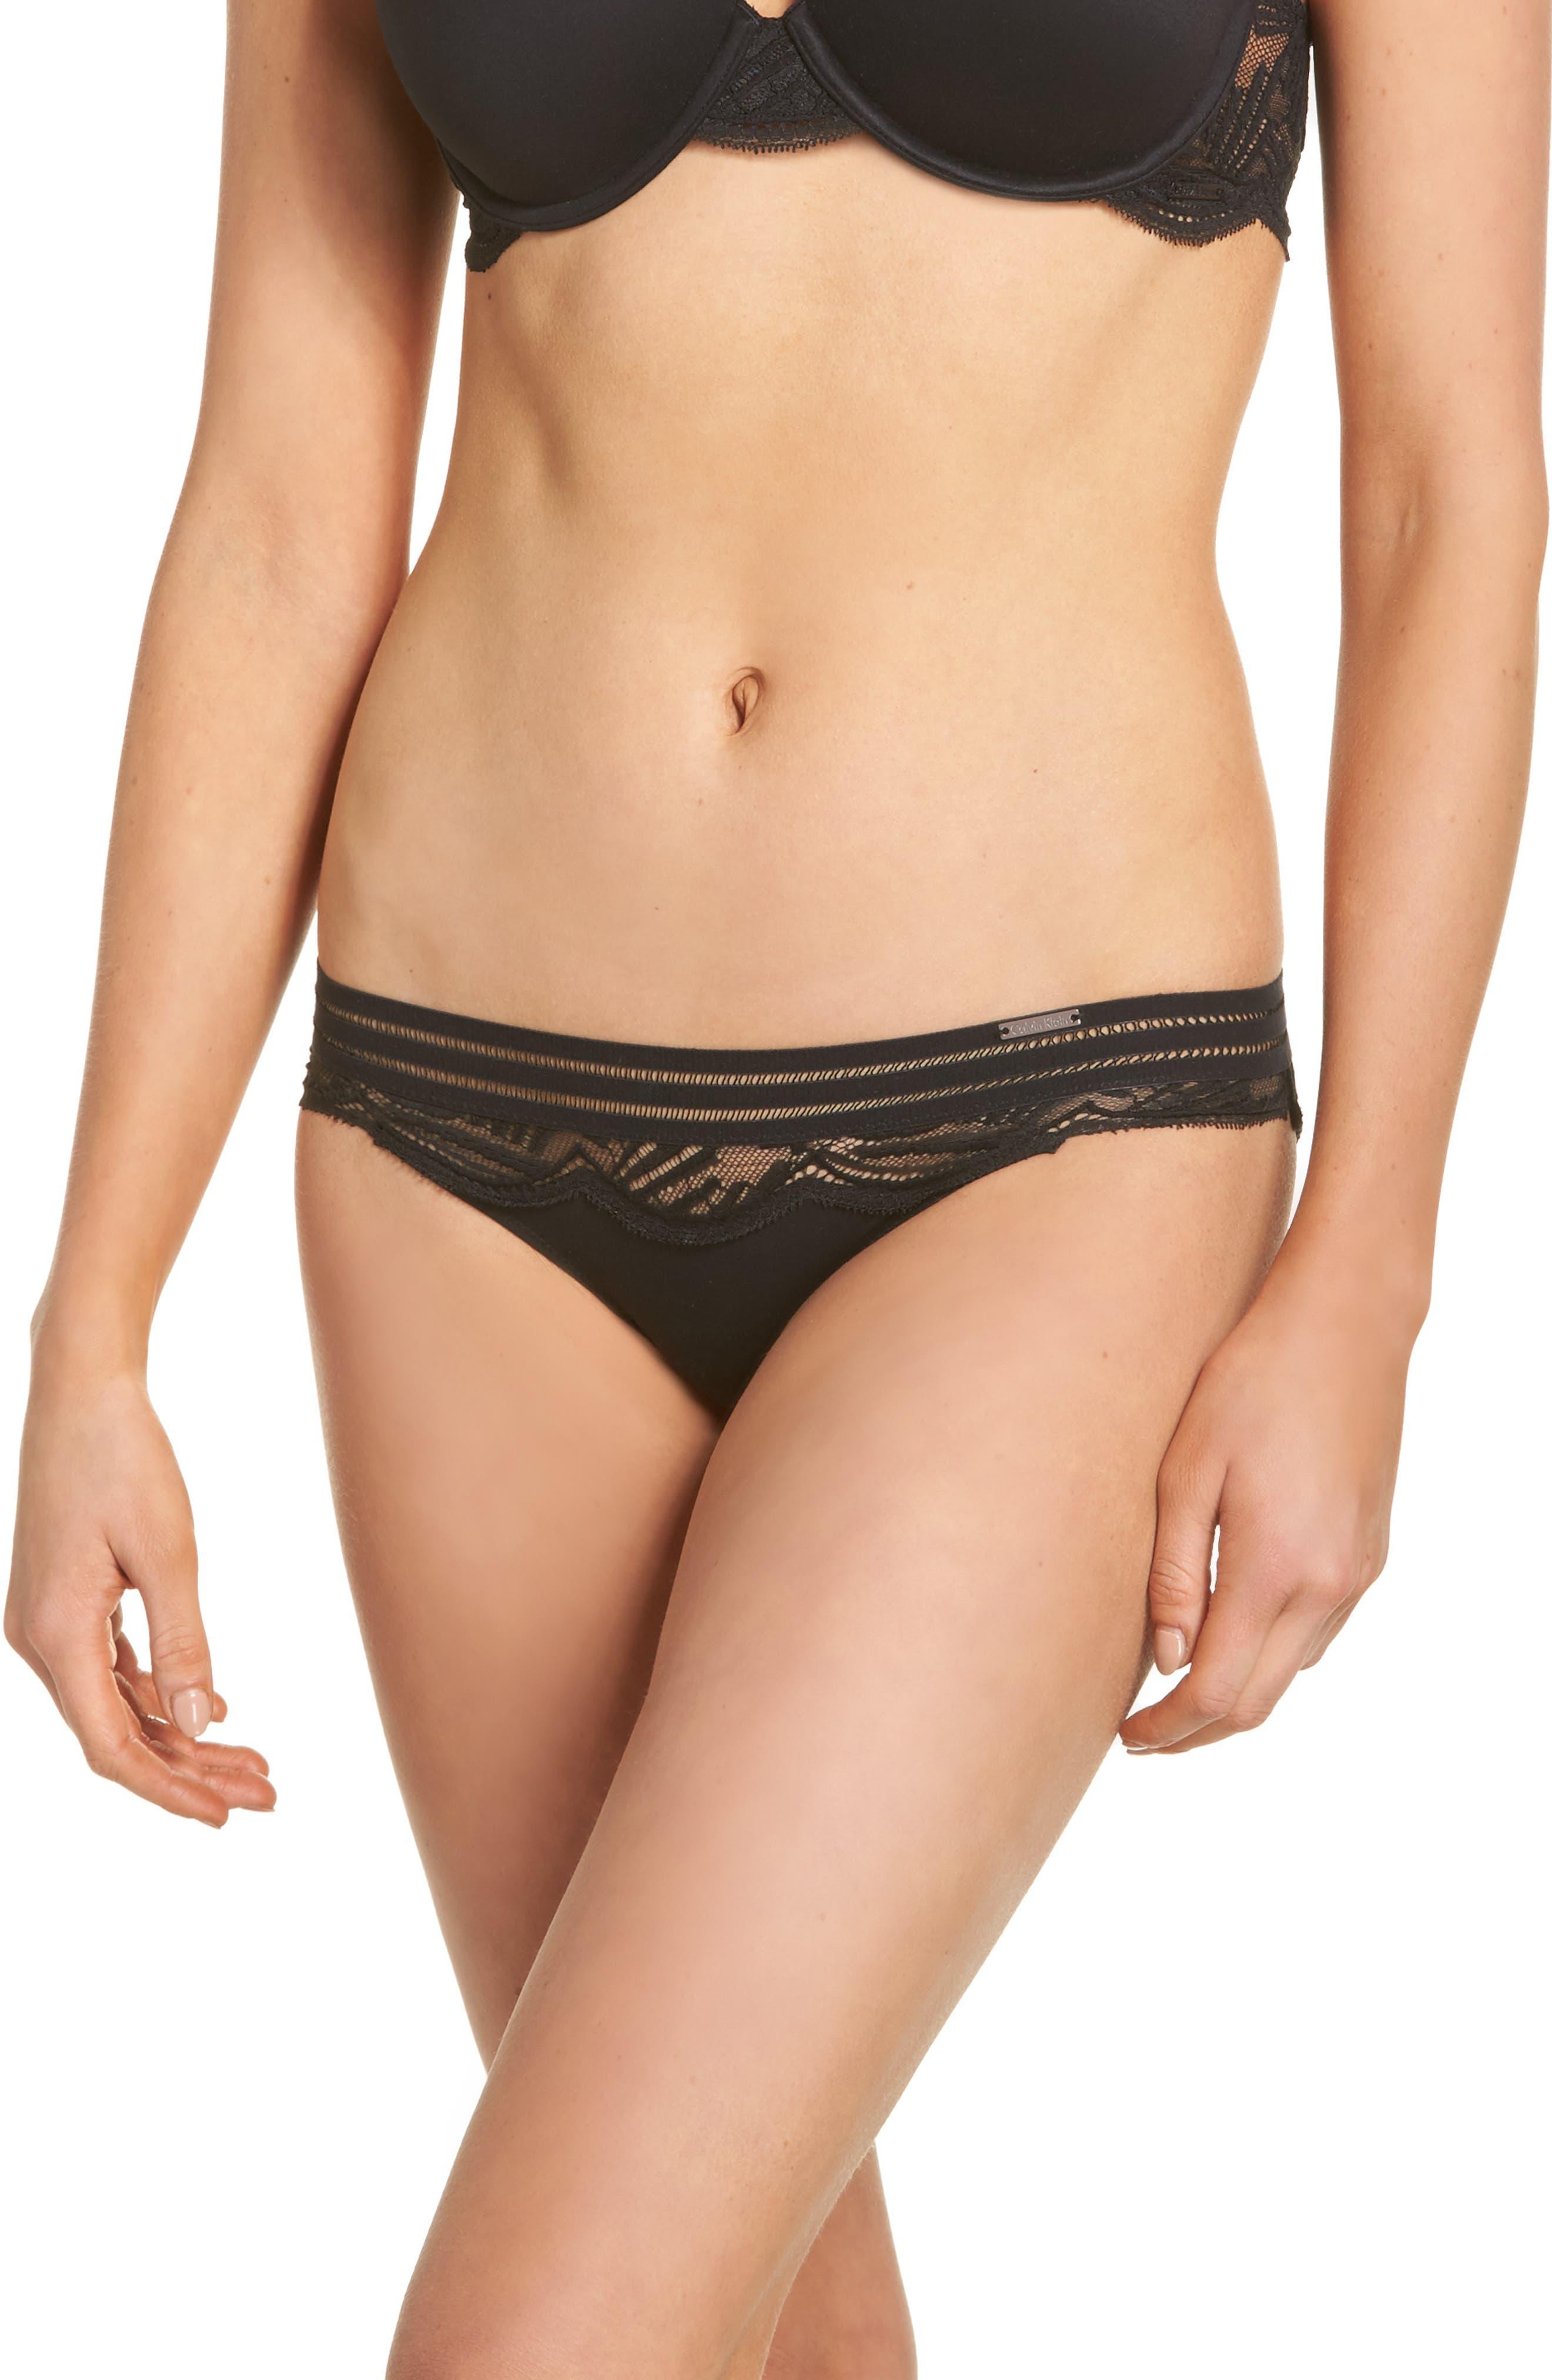 PF Slipcover Bikini,                         Main,                         color,